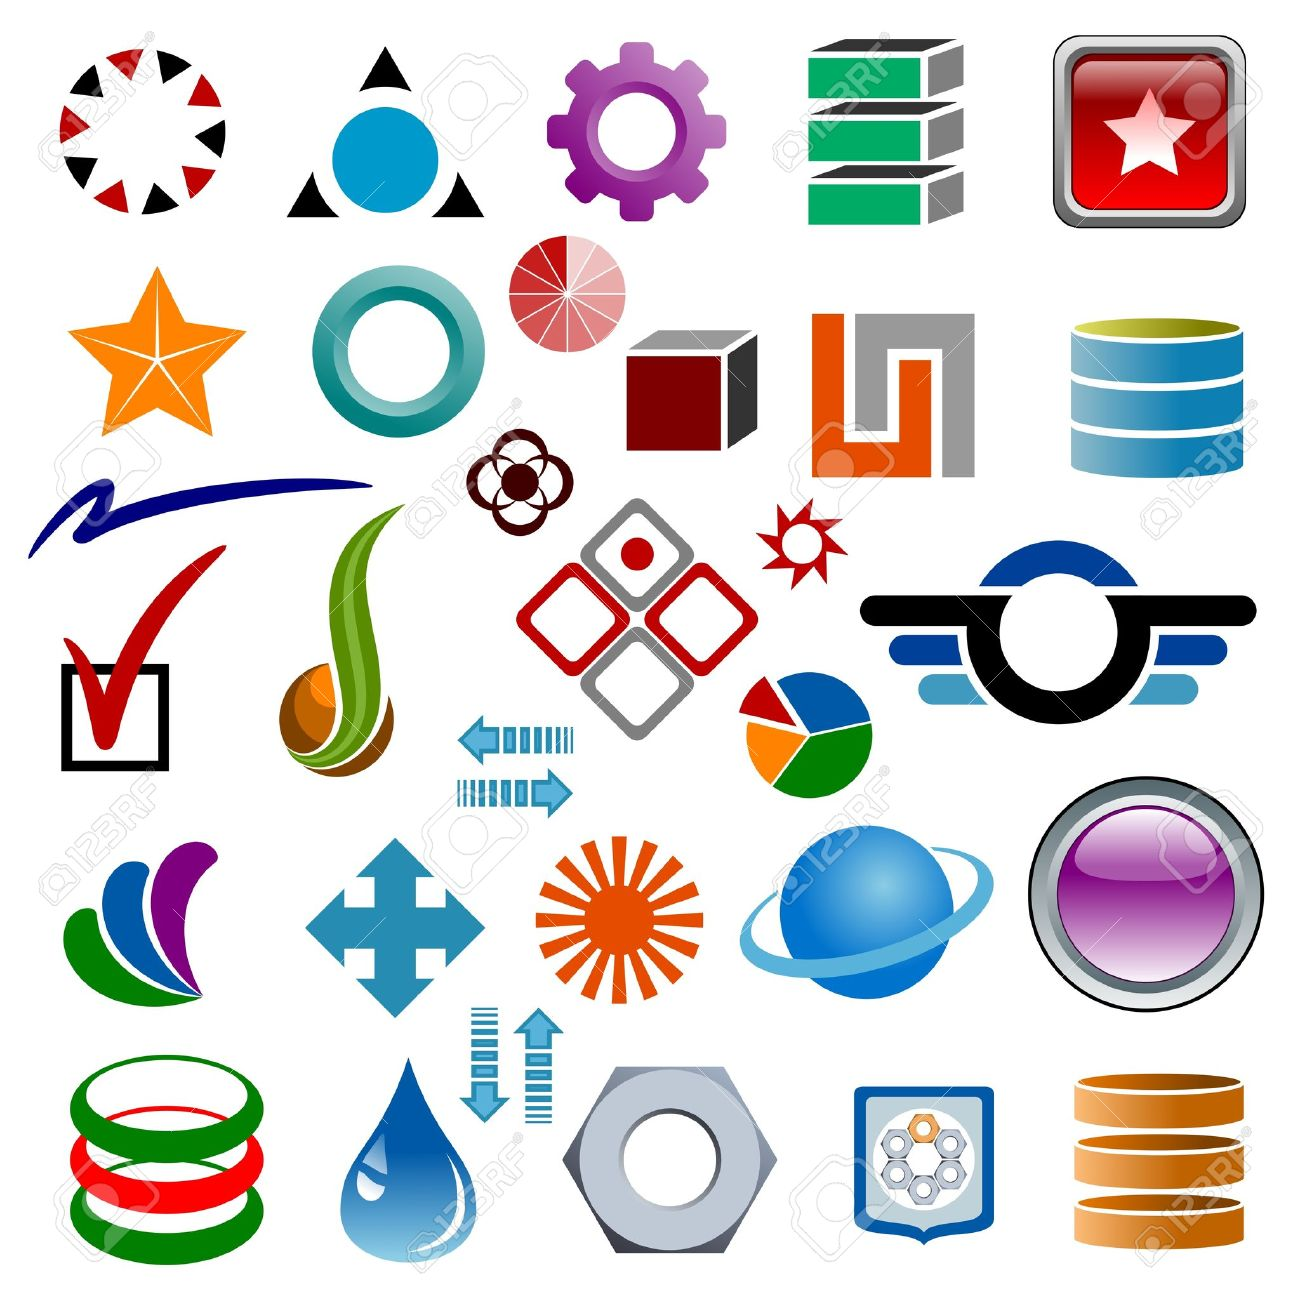 Logo design elements. Graphic design elements. Illustration. Stock Vector - 12394624